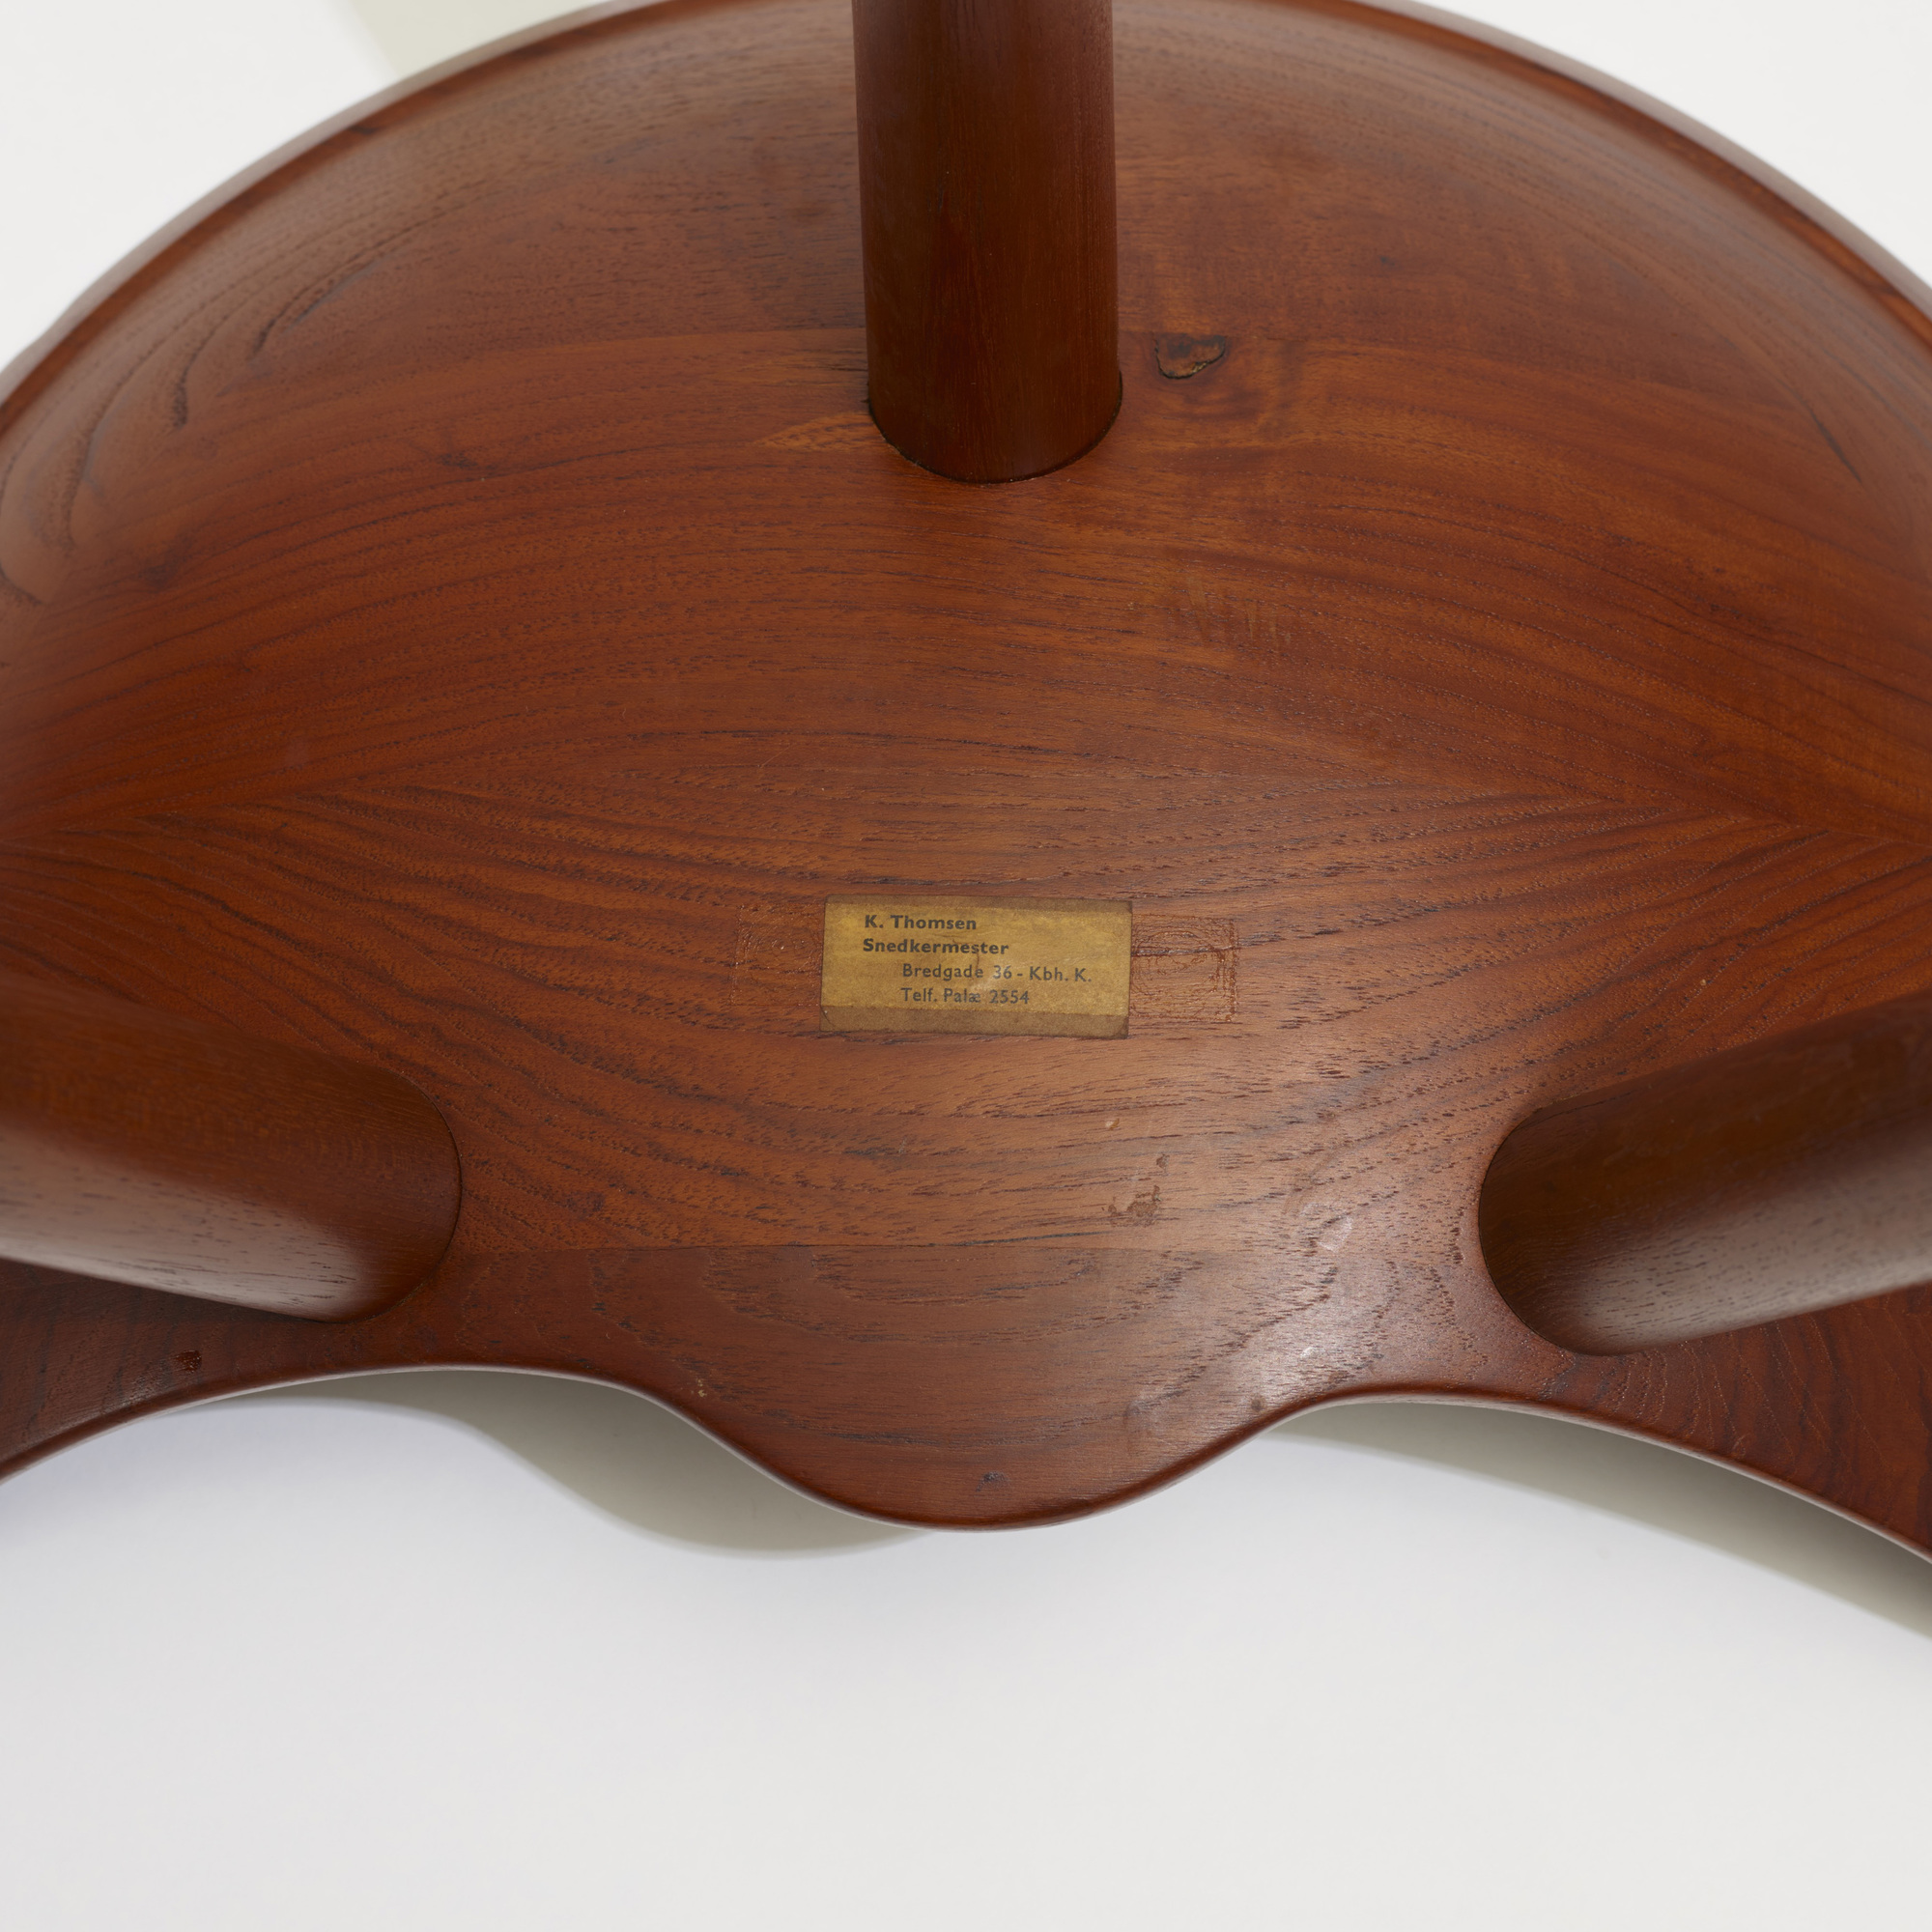 304: Mogens Lassen / stool (2 of 2)